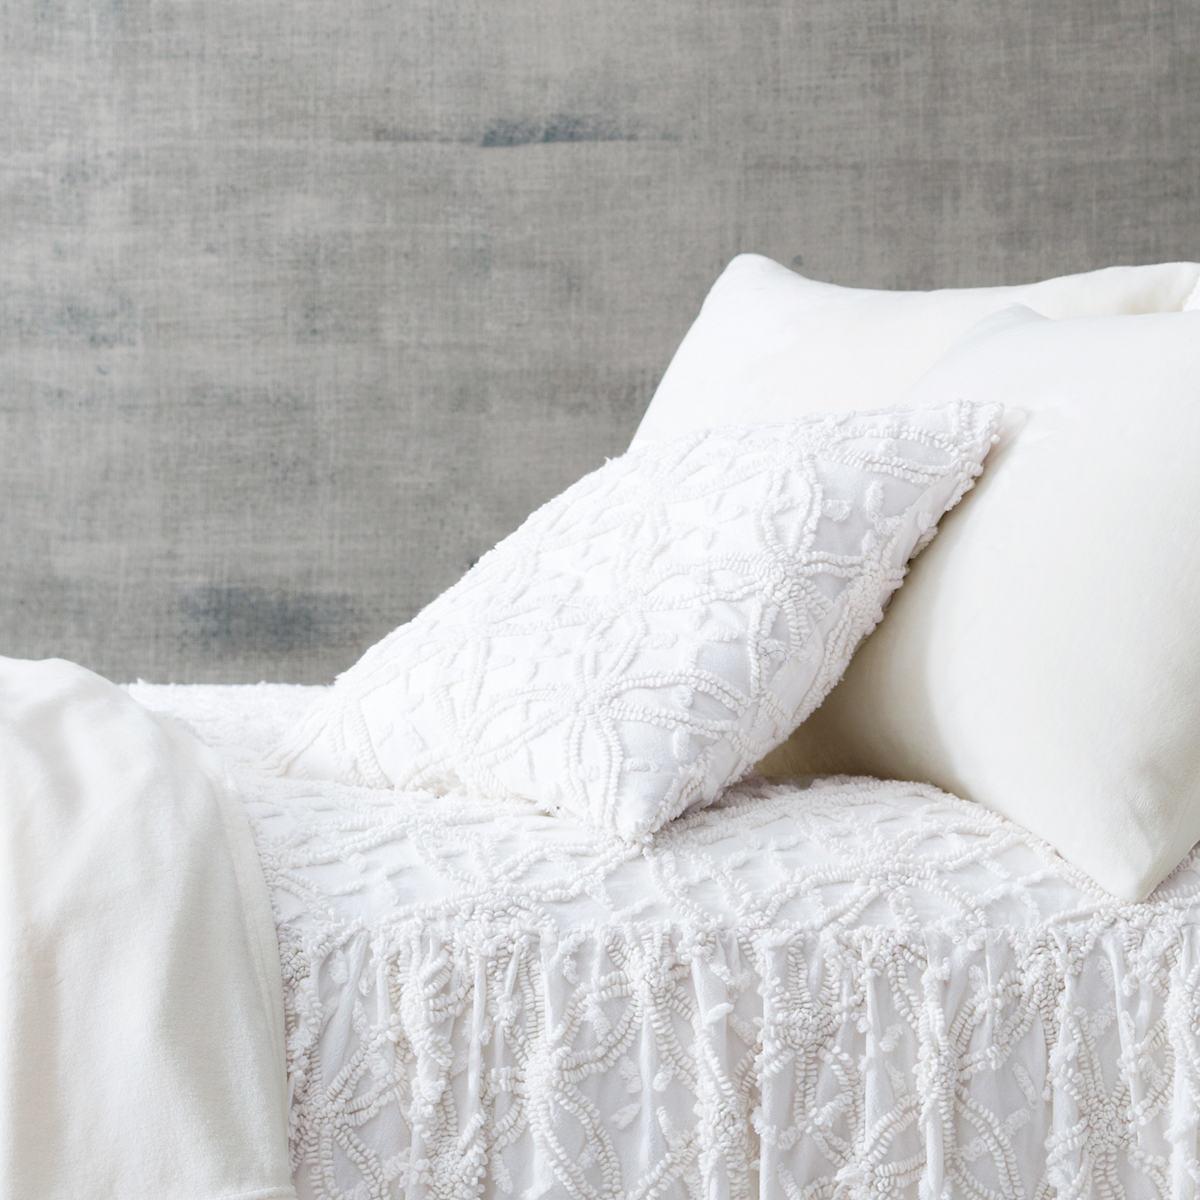 Candlewick Dove White Decorative Pillows